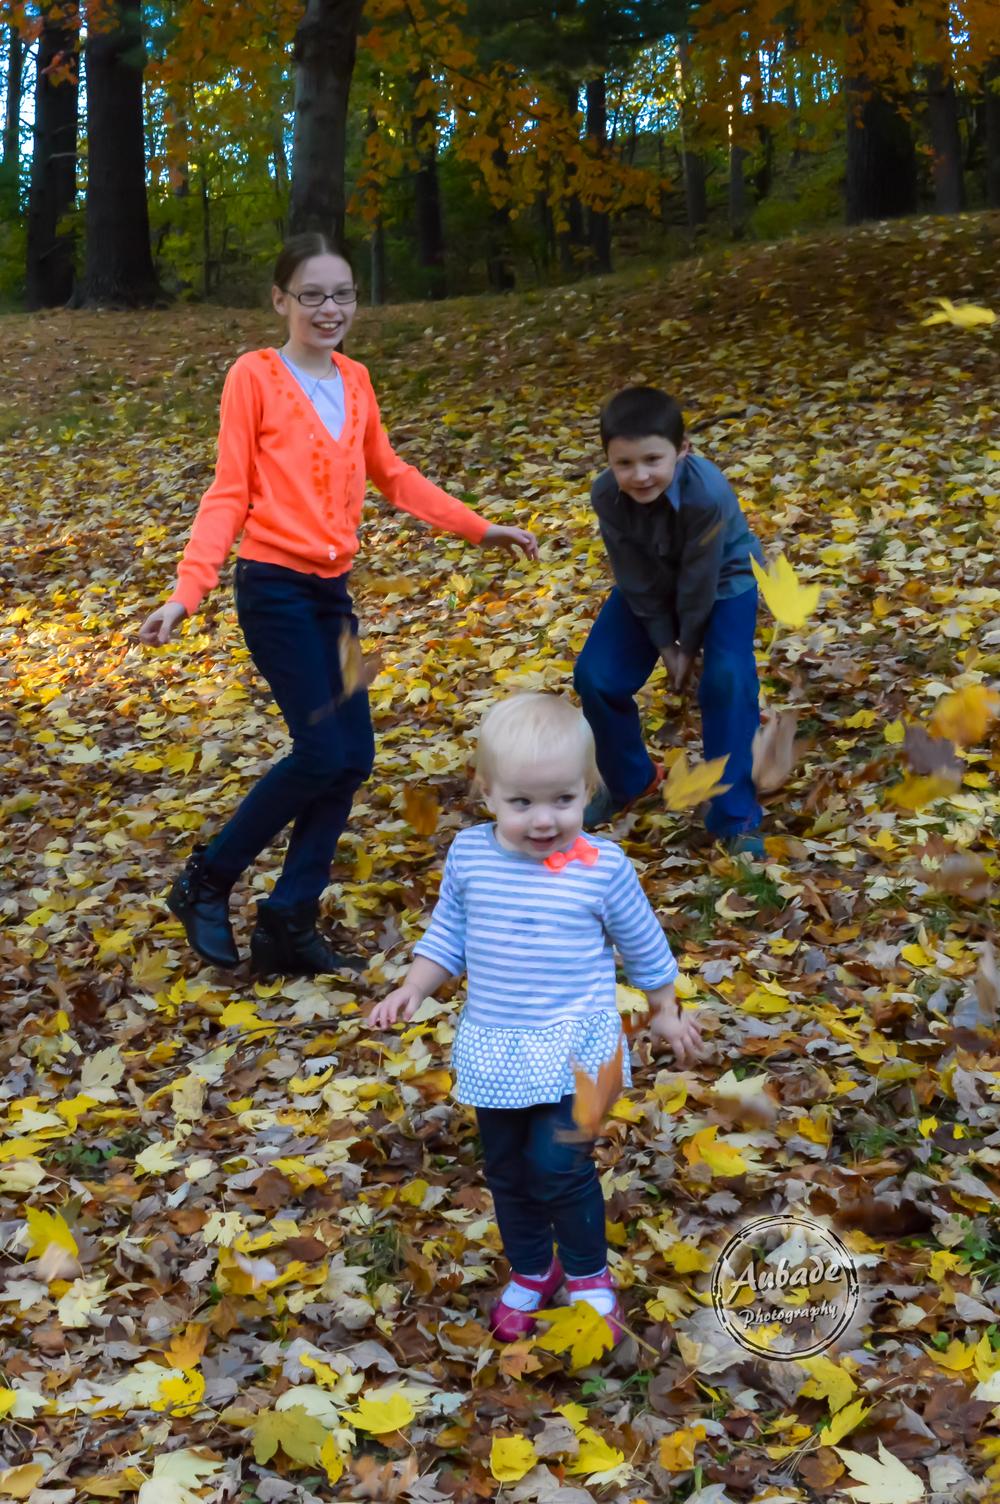 #Aubade Photography #Eau Claire photographer #Family Photography #Fall photos #leaf fight